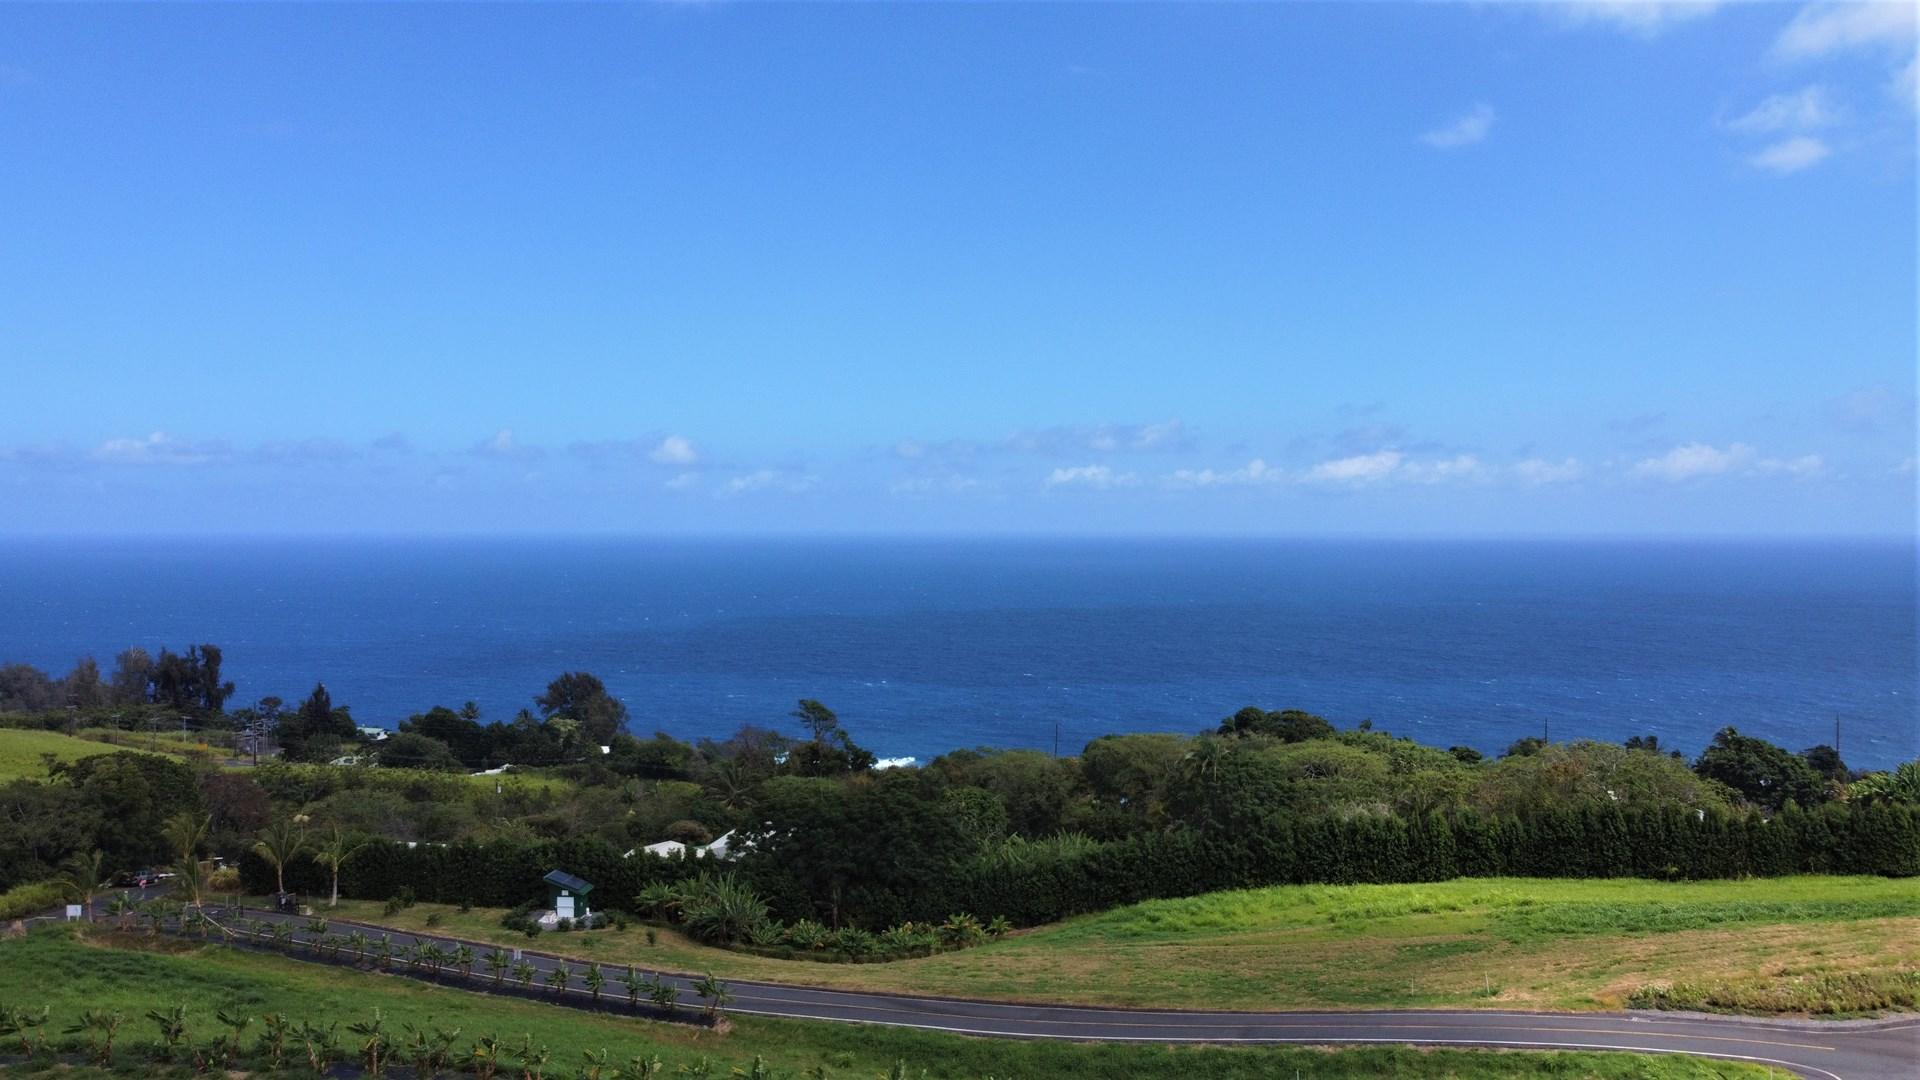 Hawaii Island sustainable living lots for sale,Hamakua Coast